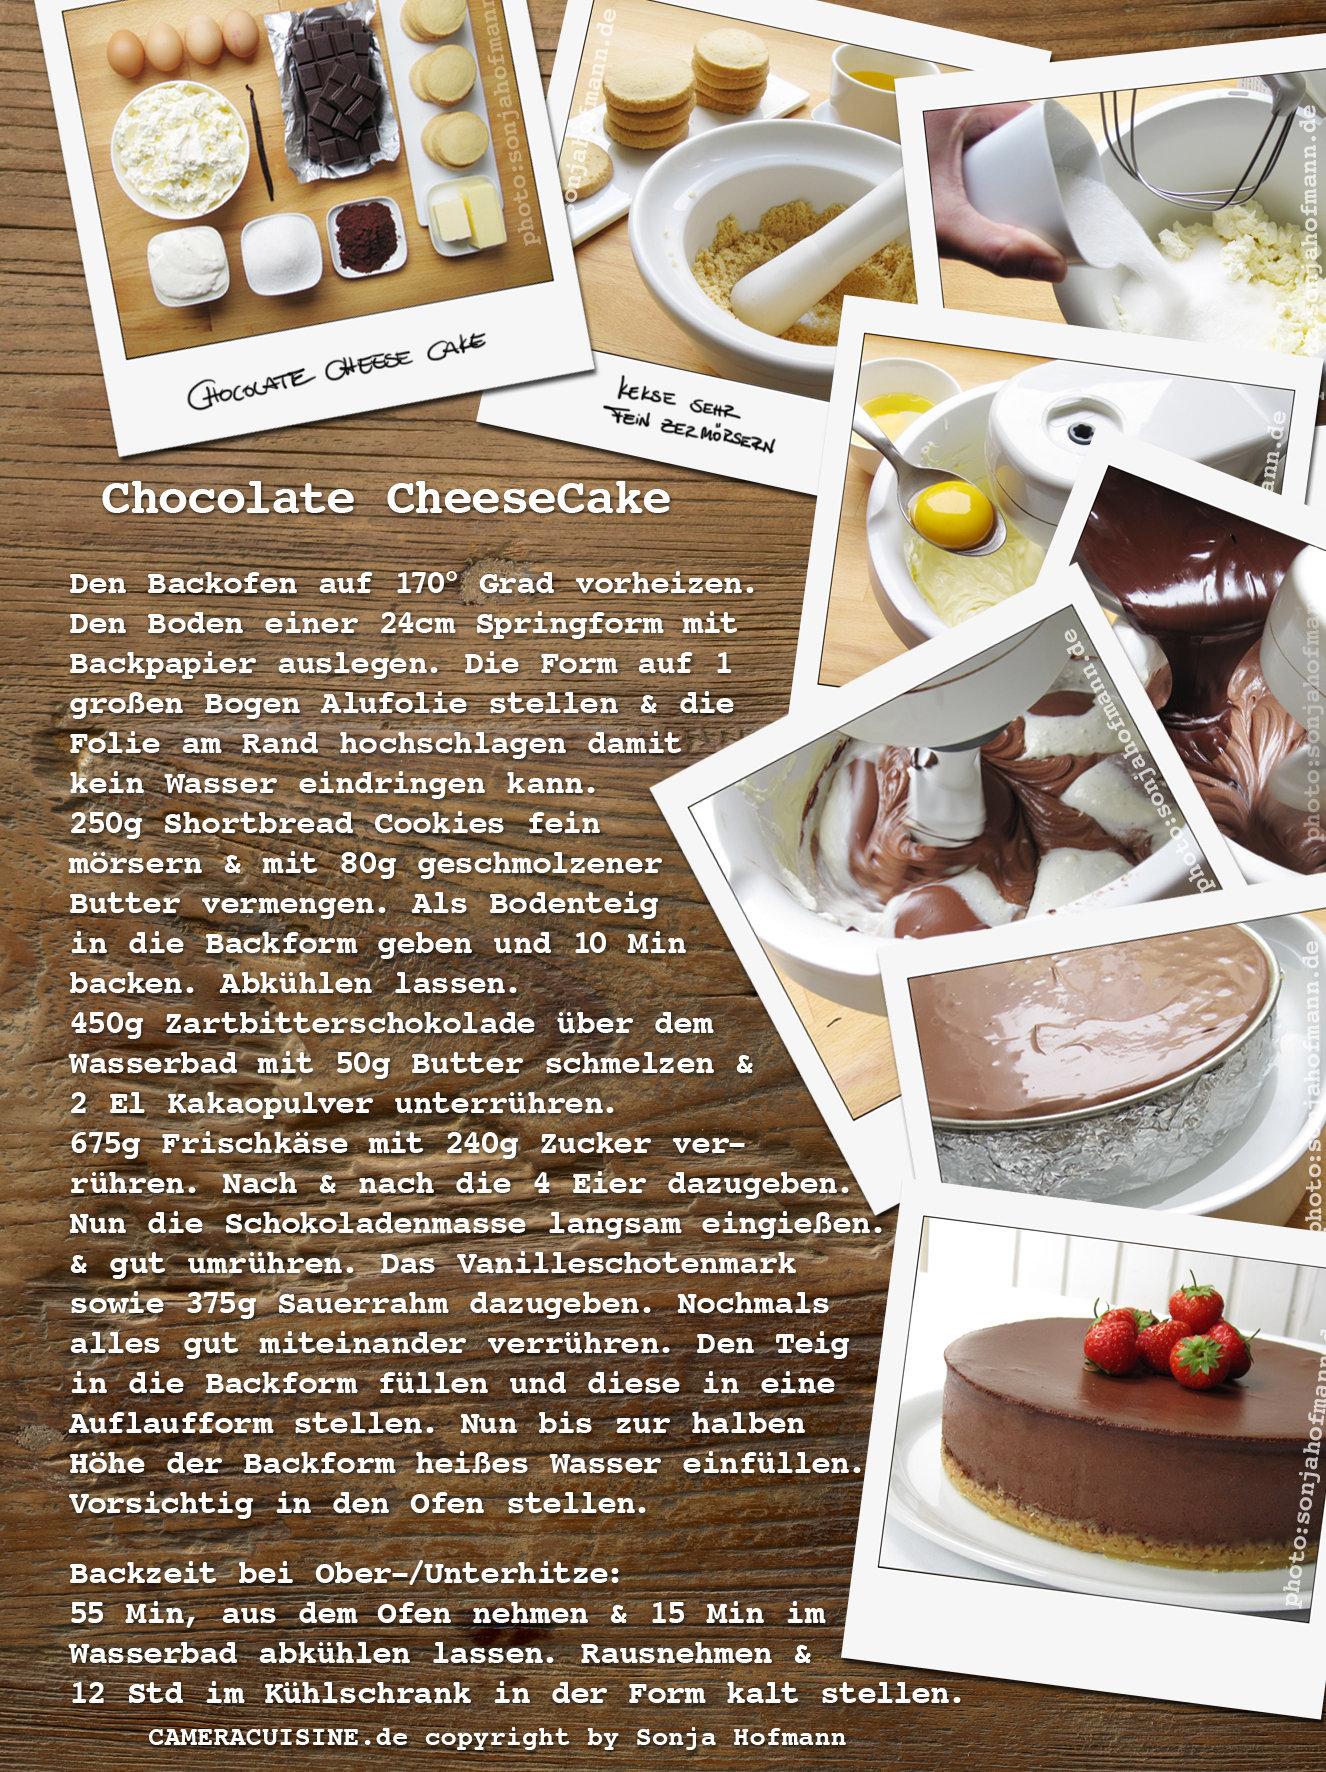 20110910_Chocolate_Cheesecake_SonjaHofmann.jpg